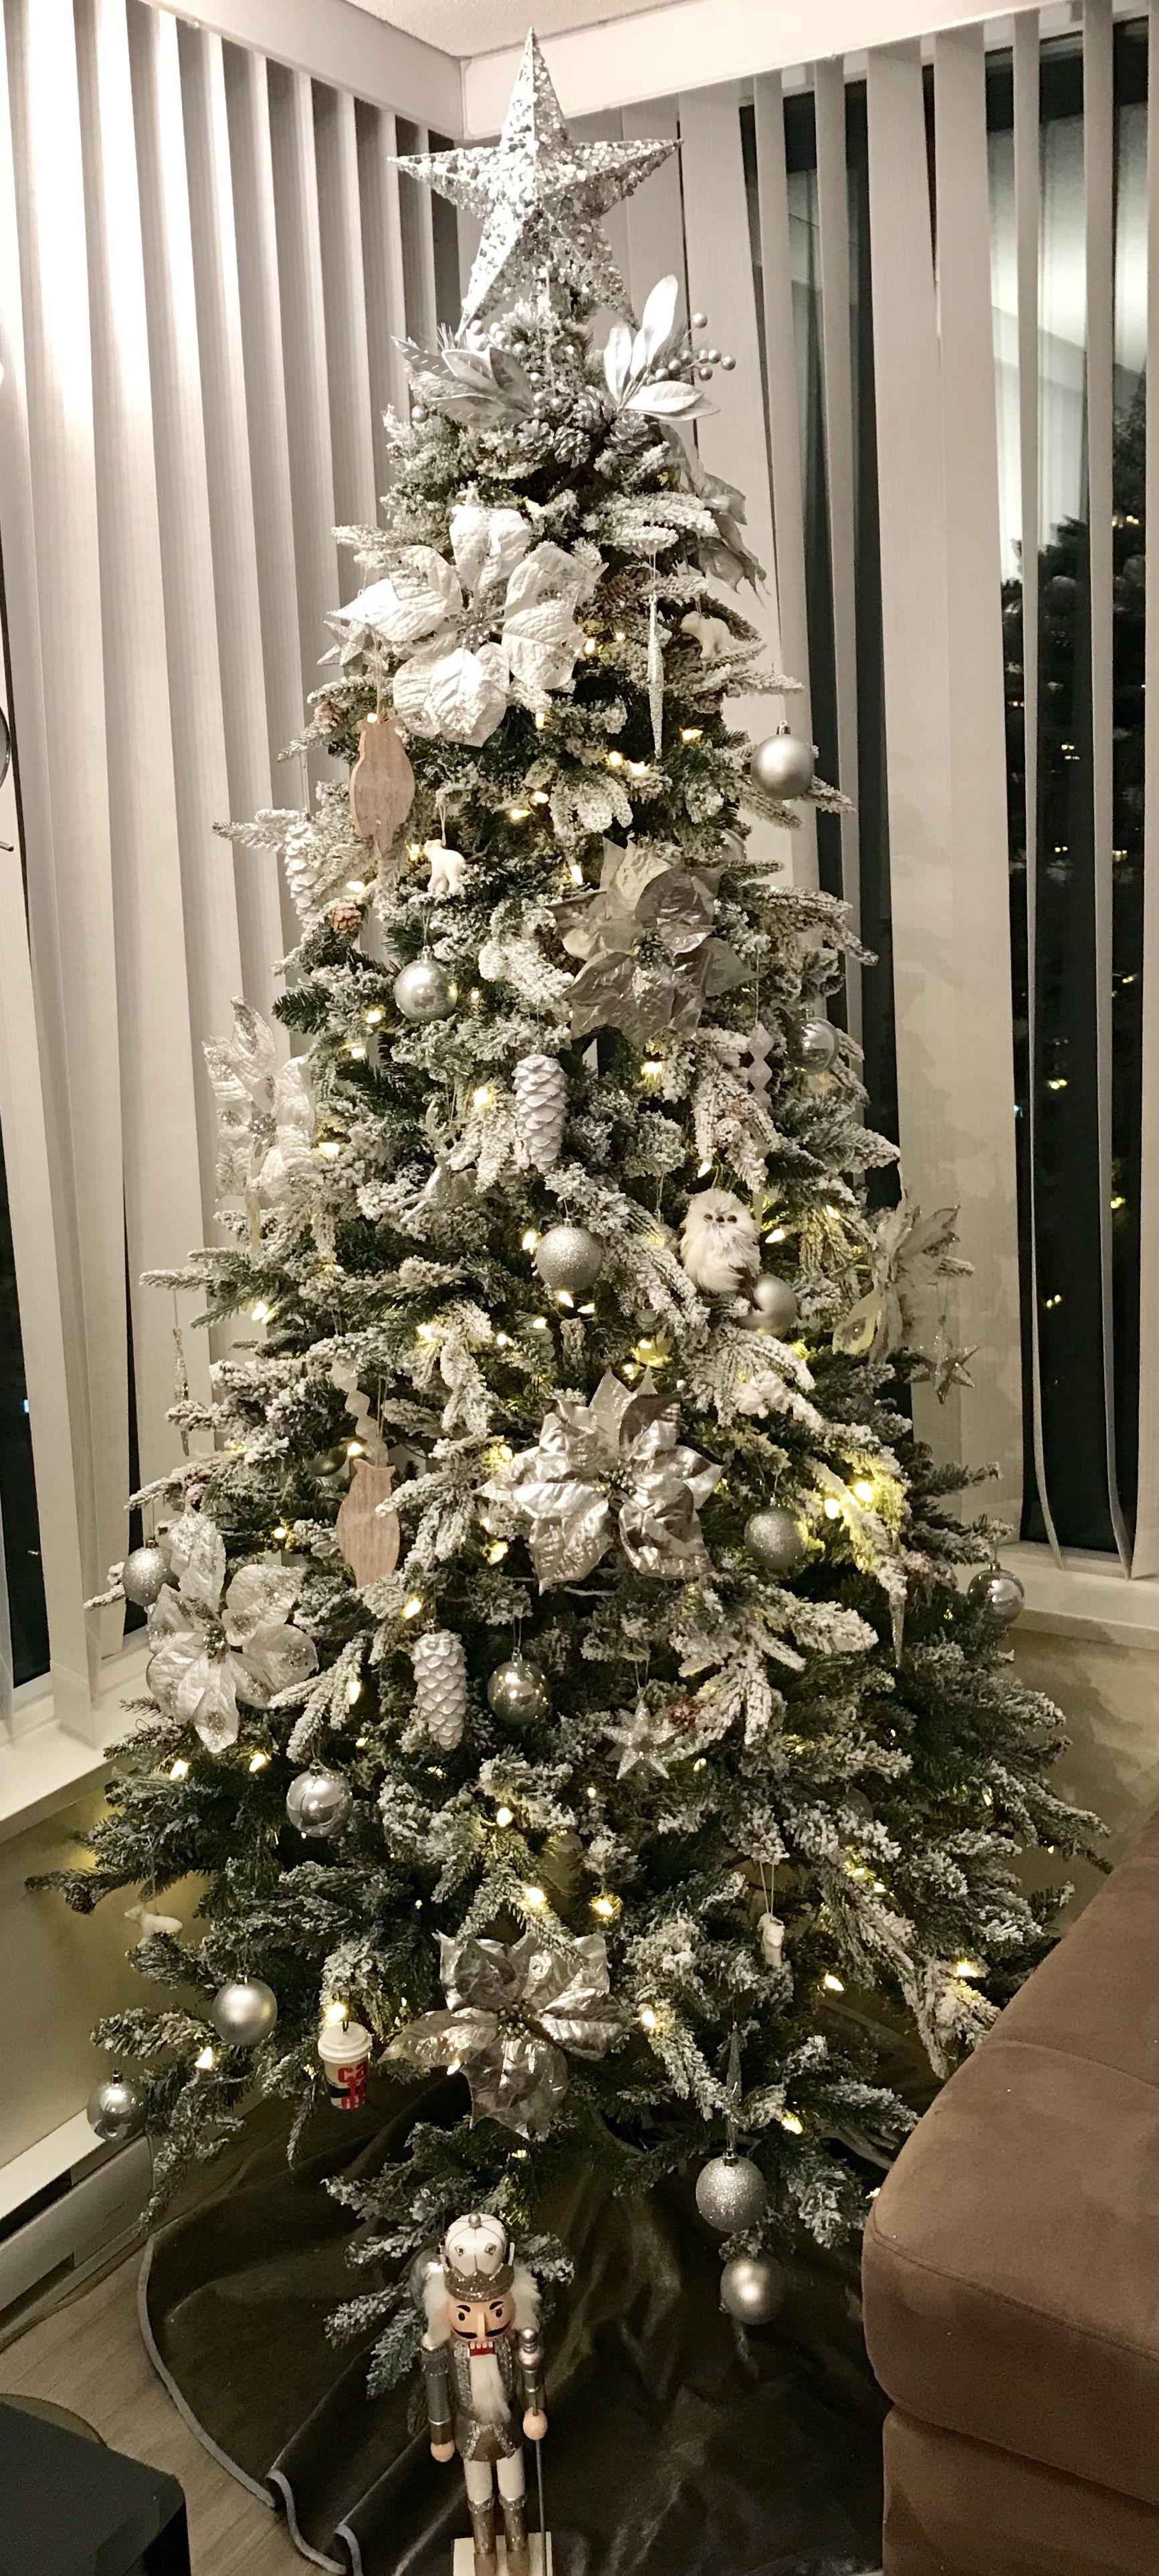 White And Silver Christmas Tree Theme Gluckstein Ultra Real Flocked Frasier 7ft Christmas Tree With Silver Christmas Tree 7ft Christmas Tree Christmas Tree